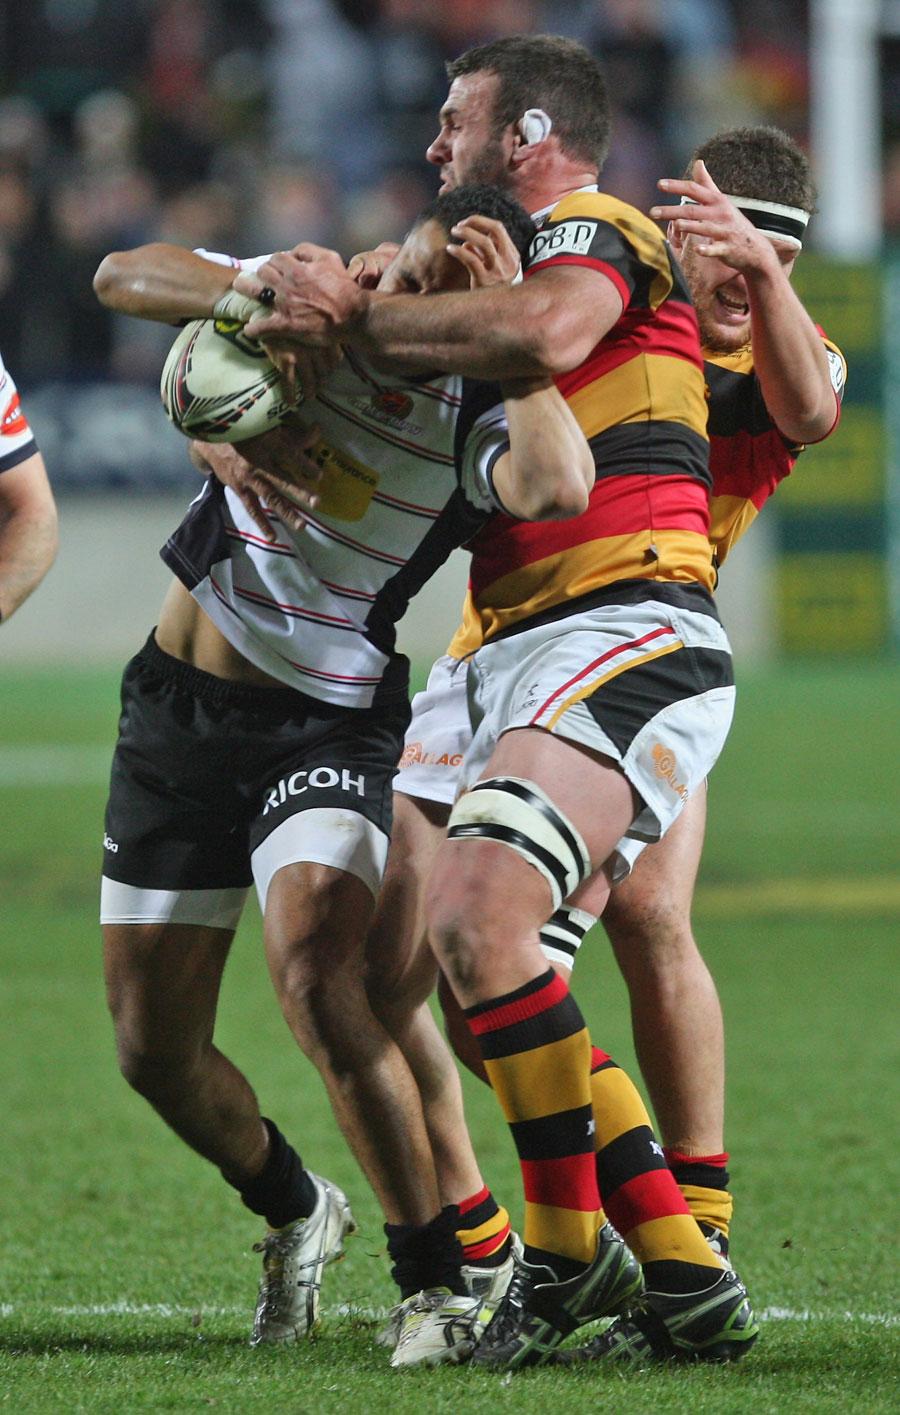 Waikato's Alex Bradley tackles Canterbury's Telusa Veainu